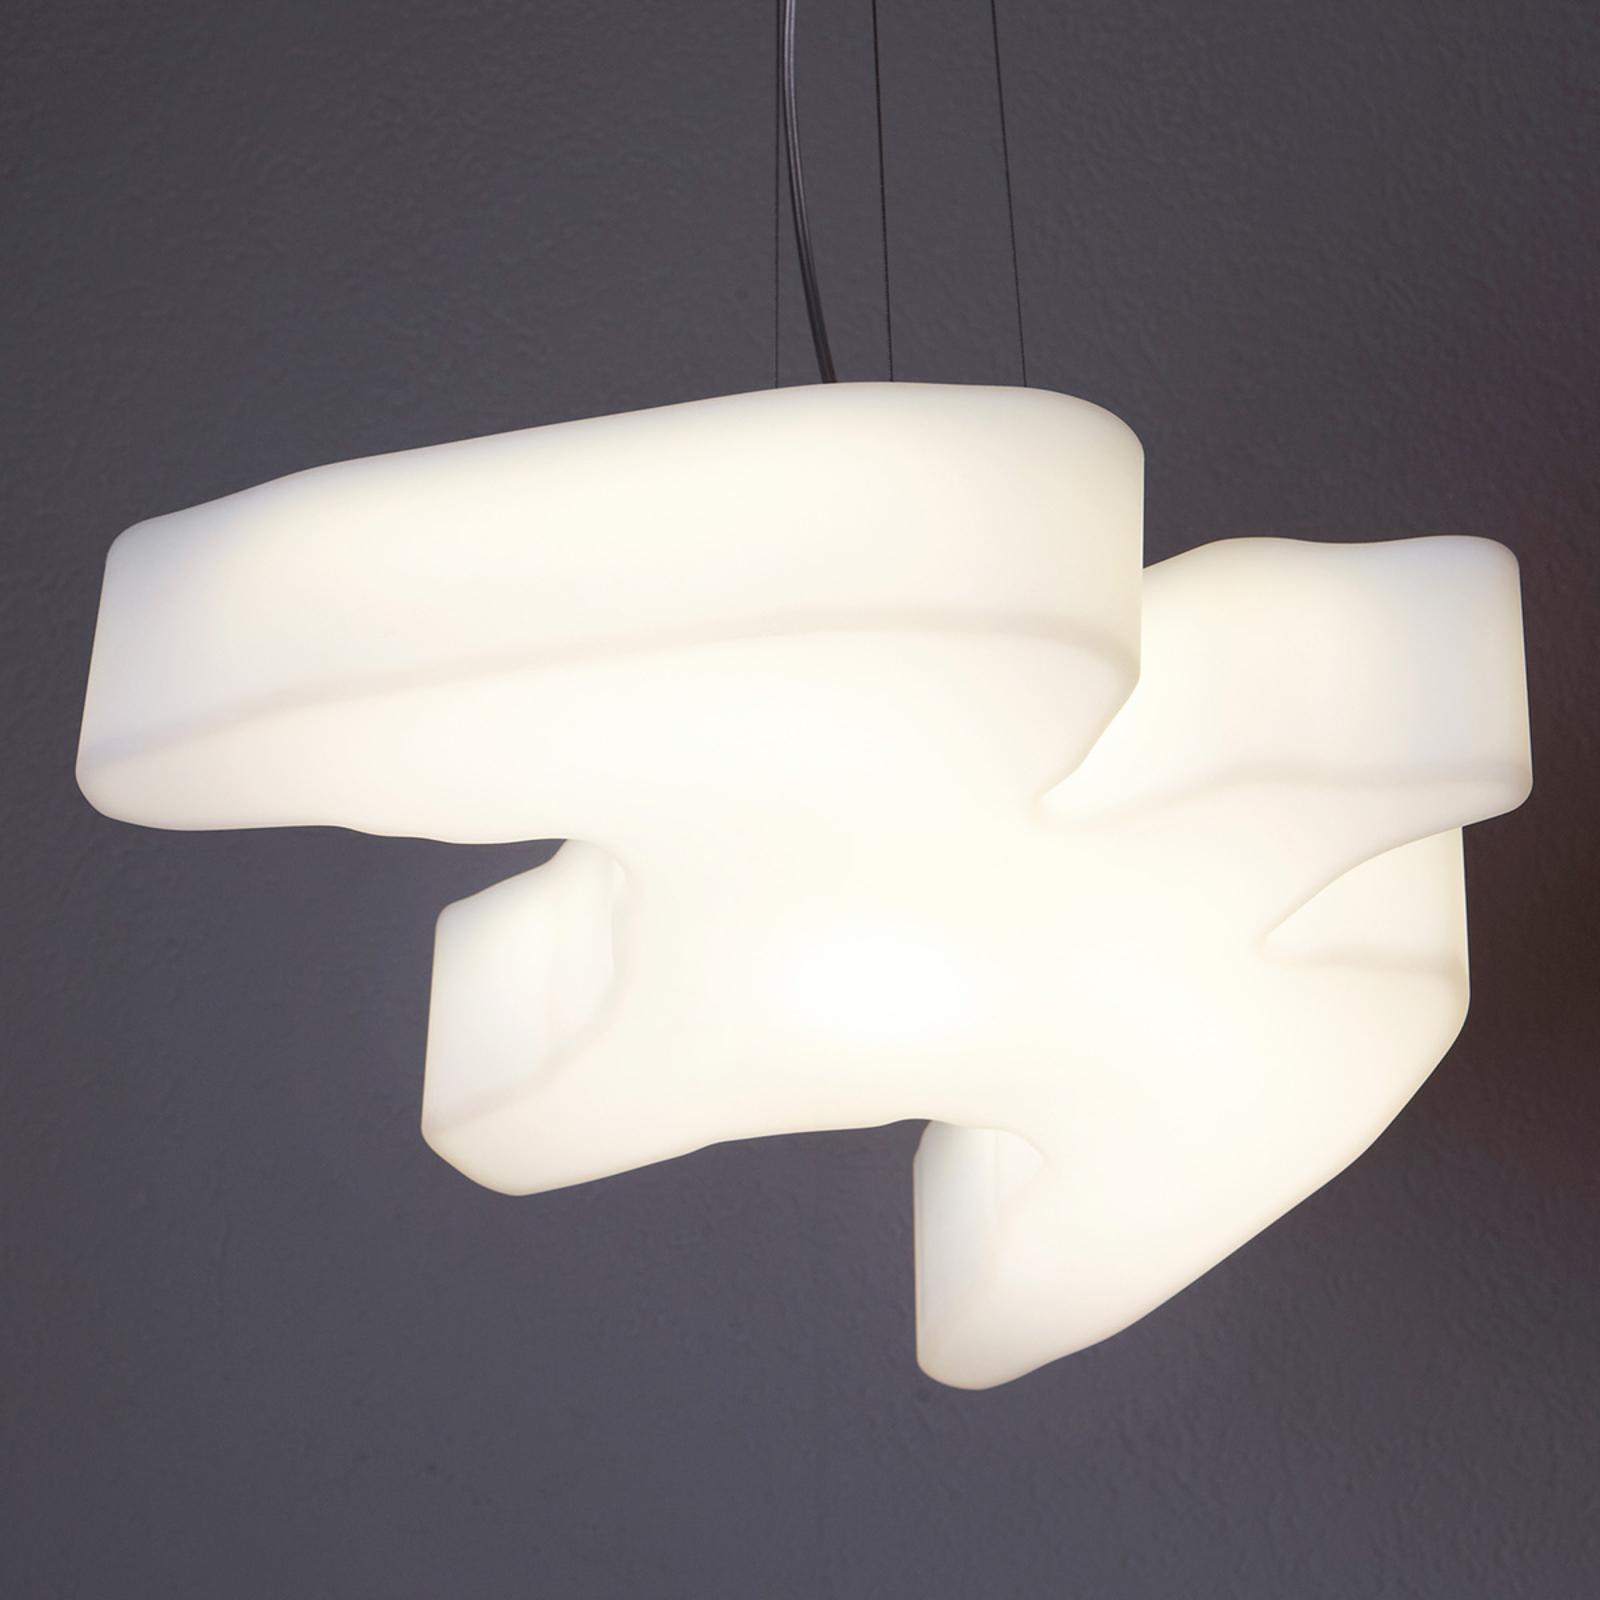 LED hanglamp The Bird